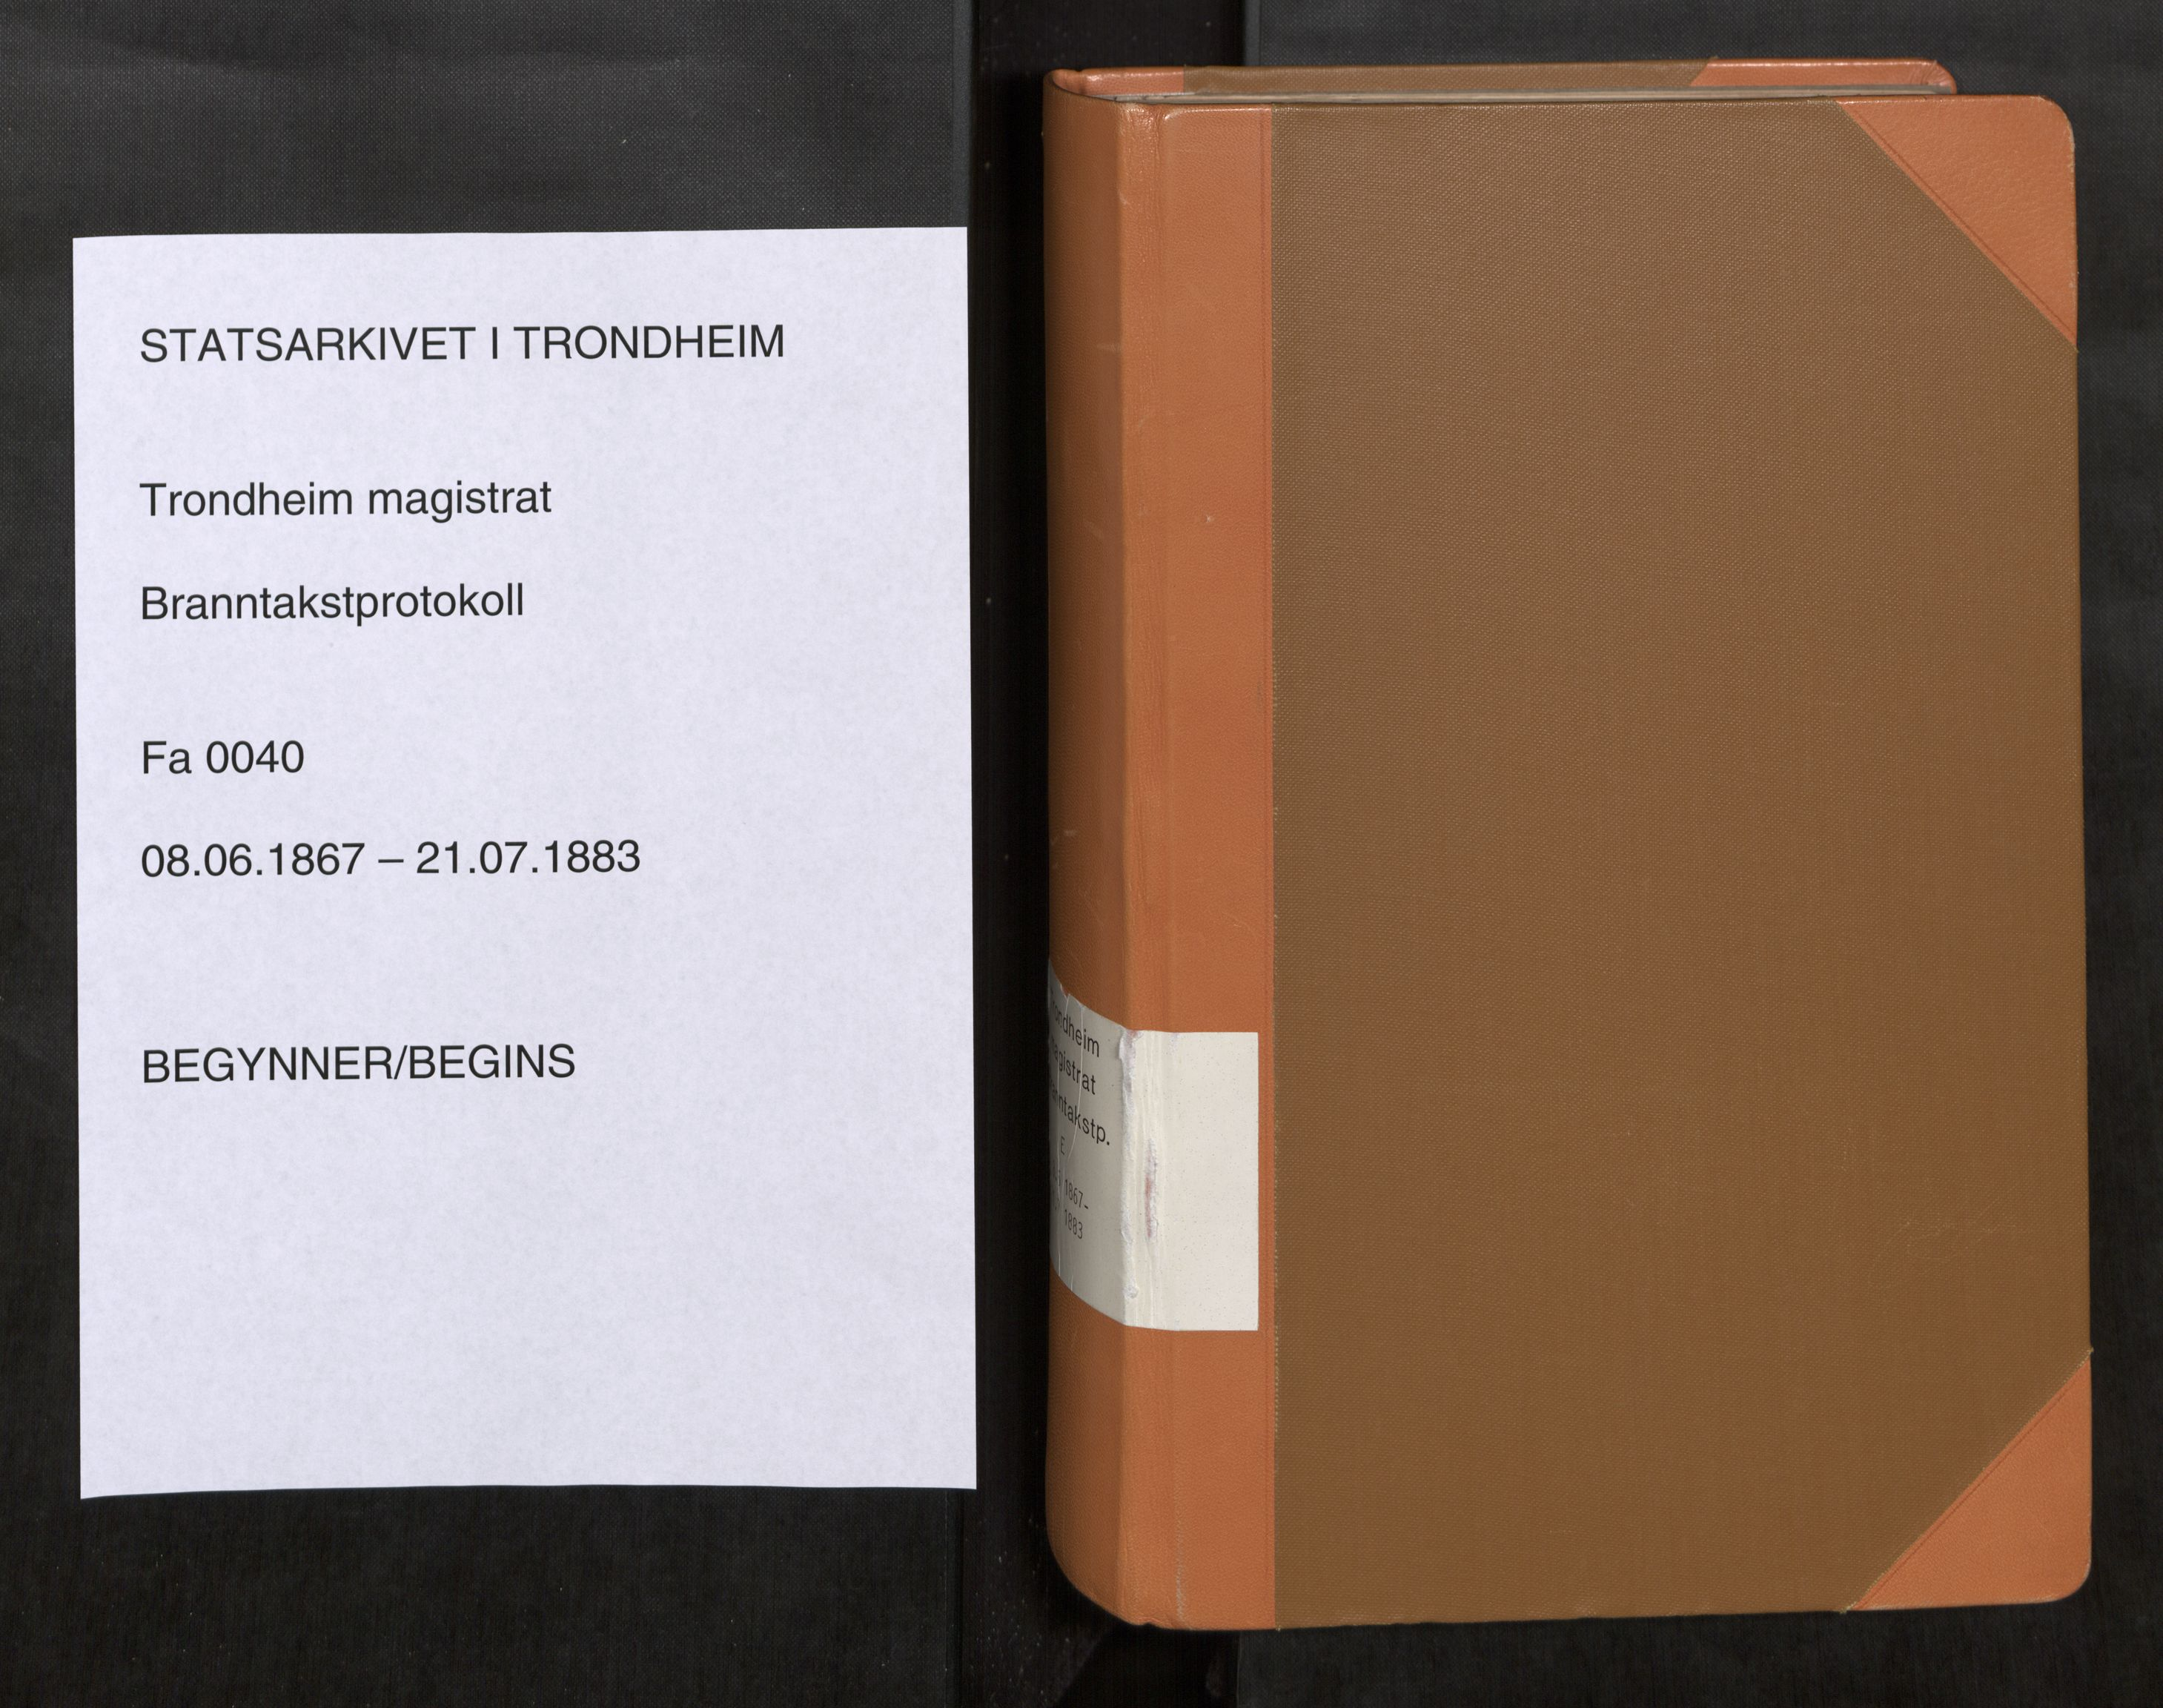 SAT, Norges Brannkasse Trondheim magistrat, Branntakstprotokoller med tekst, nr. 40: 1867-1883, 1867-1883